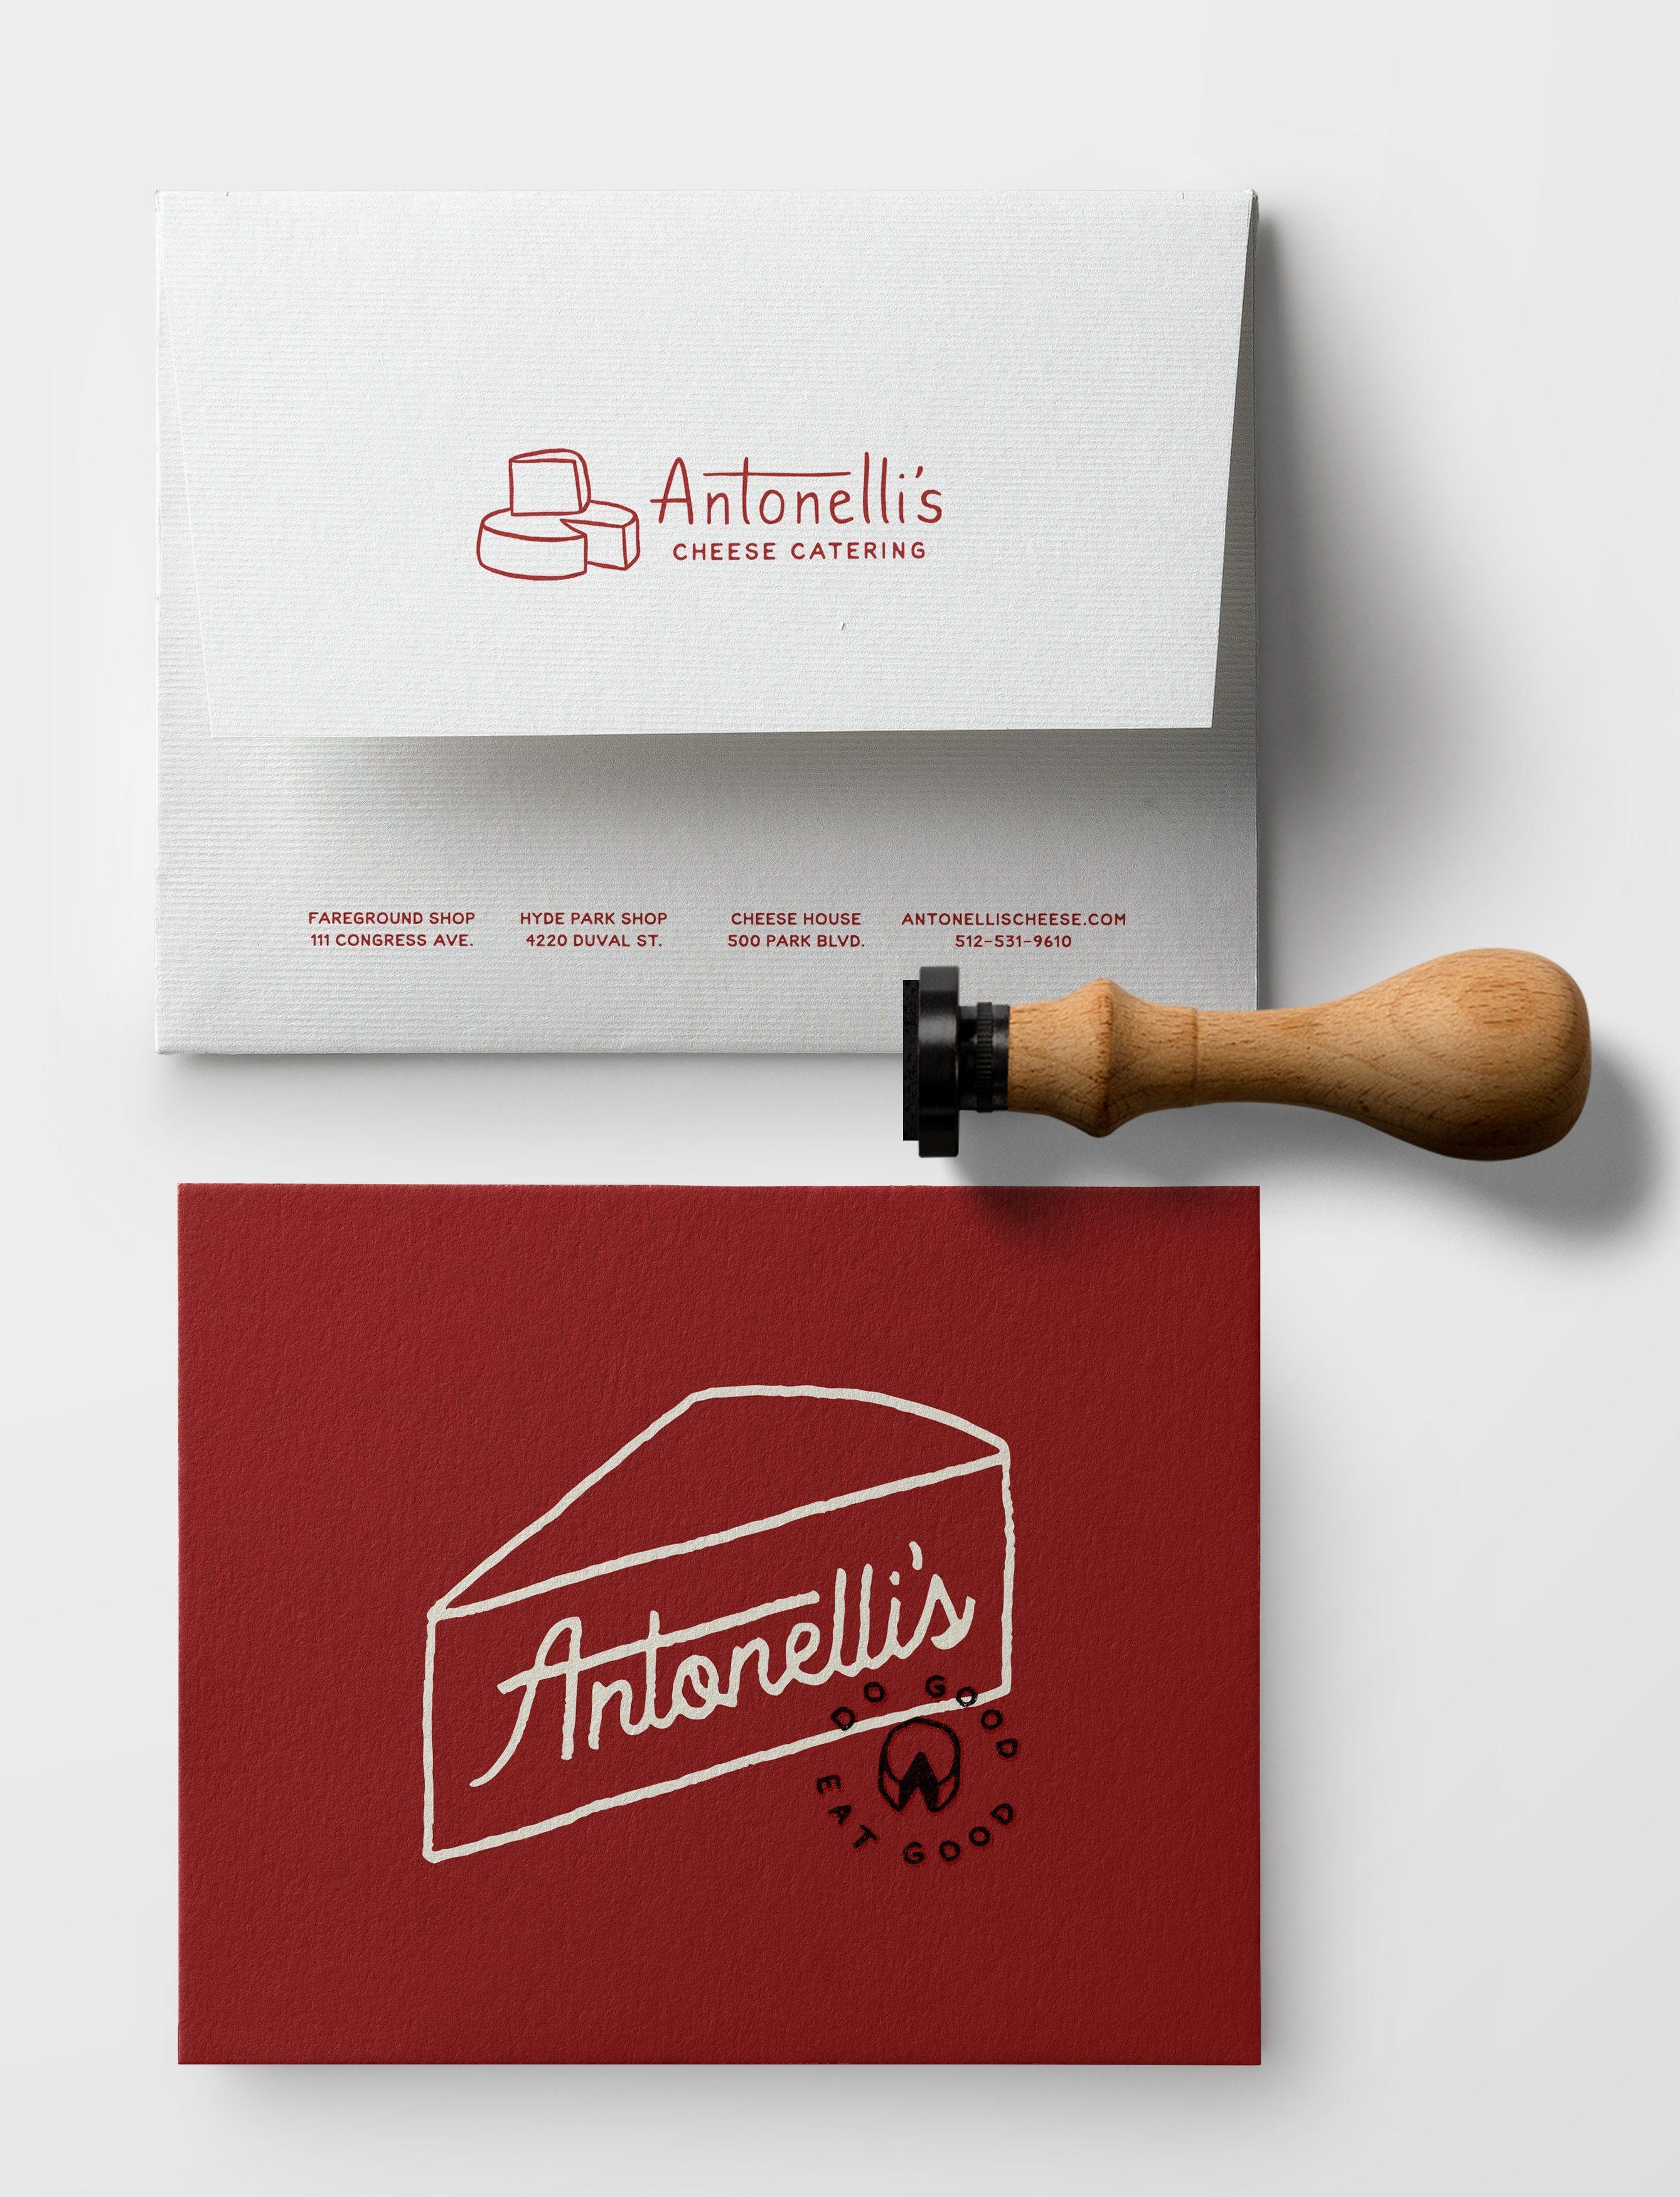 Antonelli's gift cards